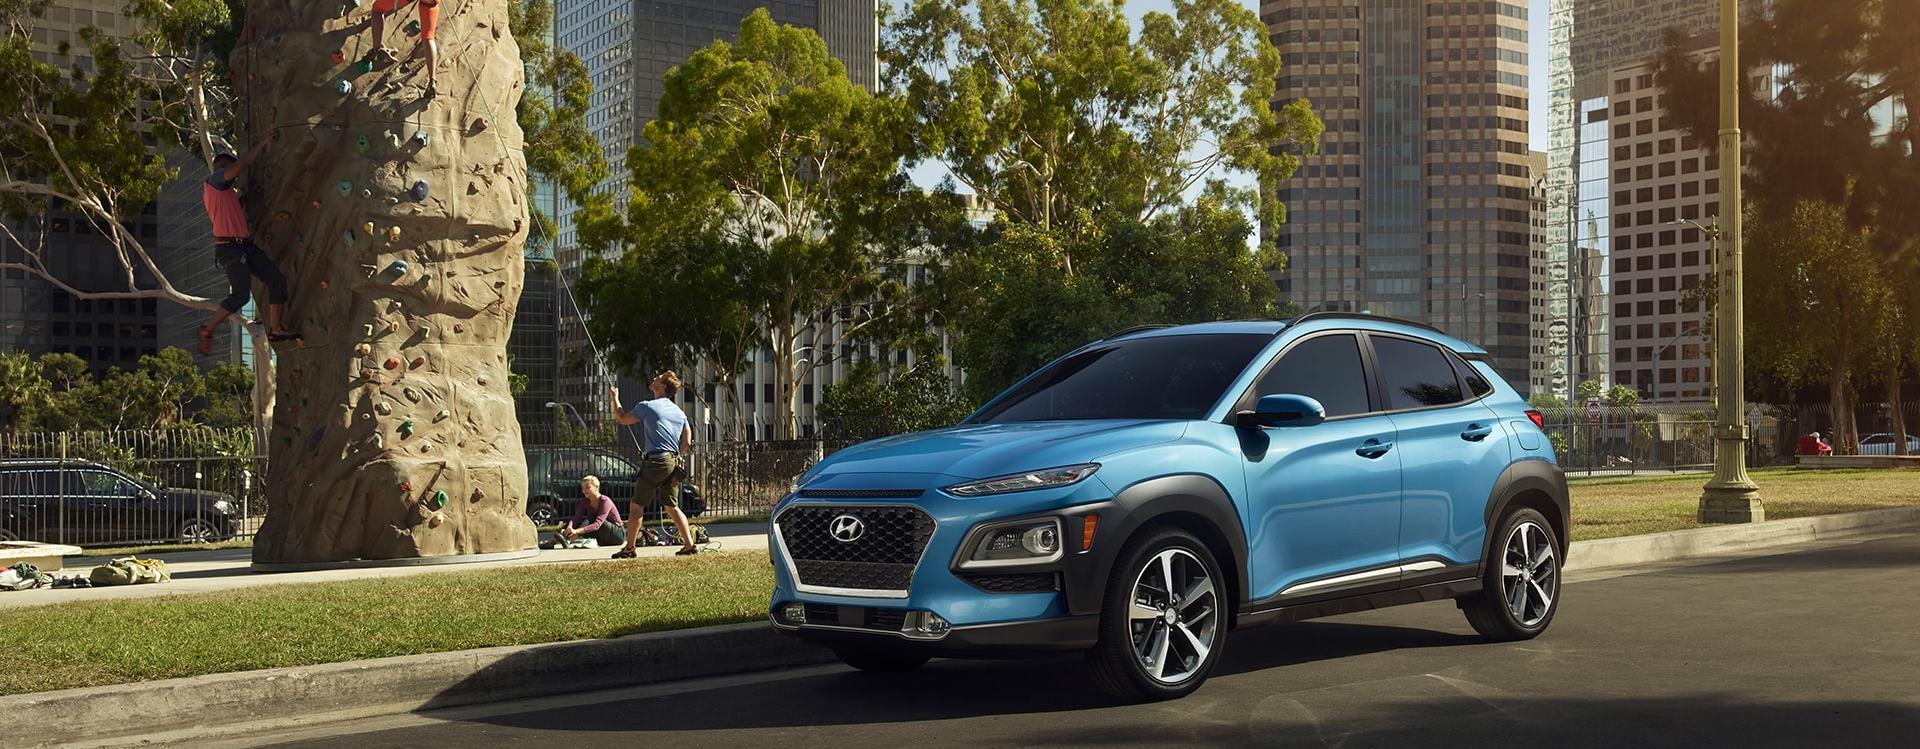 2020 Hyundai Kona Lease in Goshen, NY